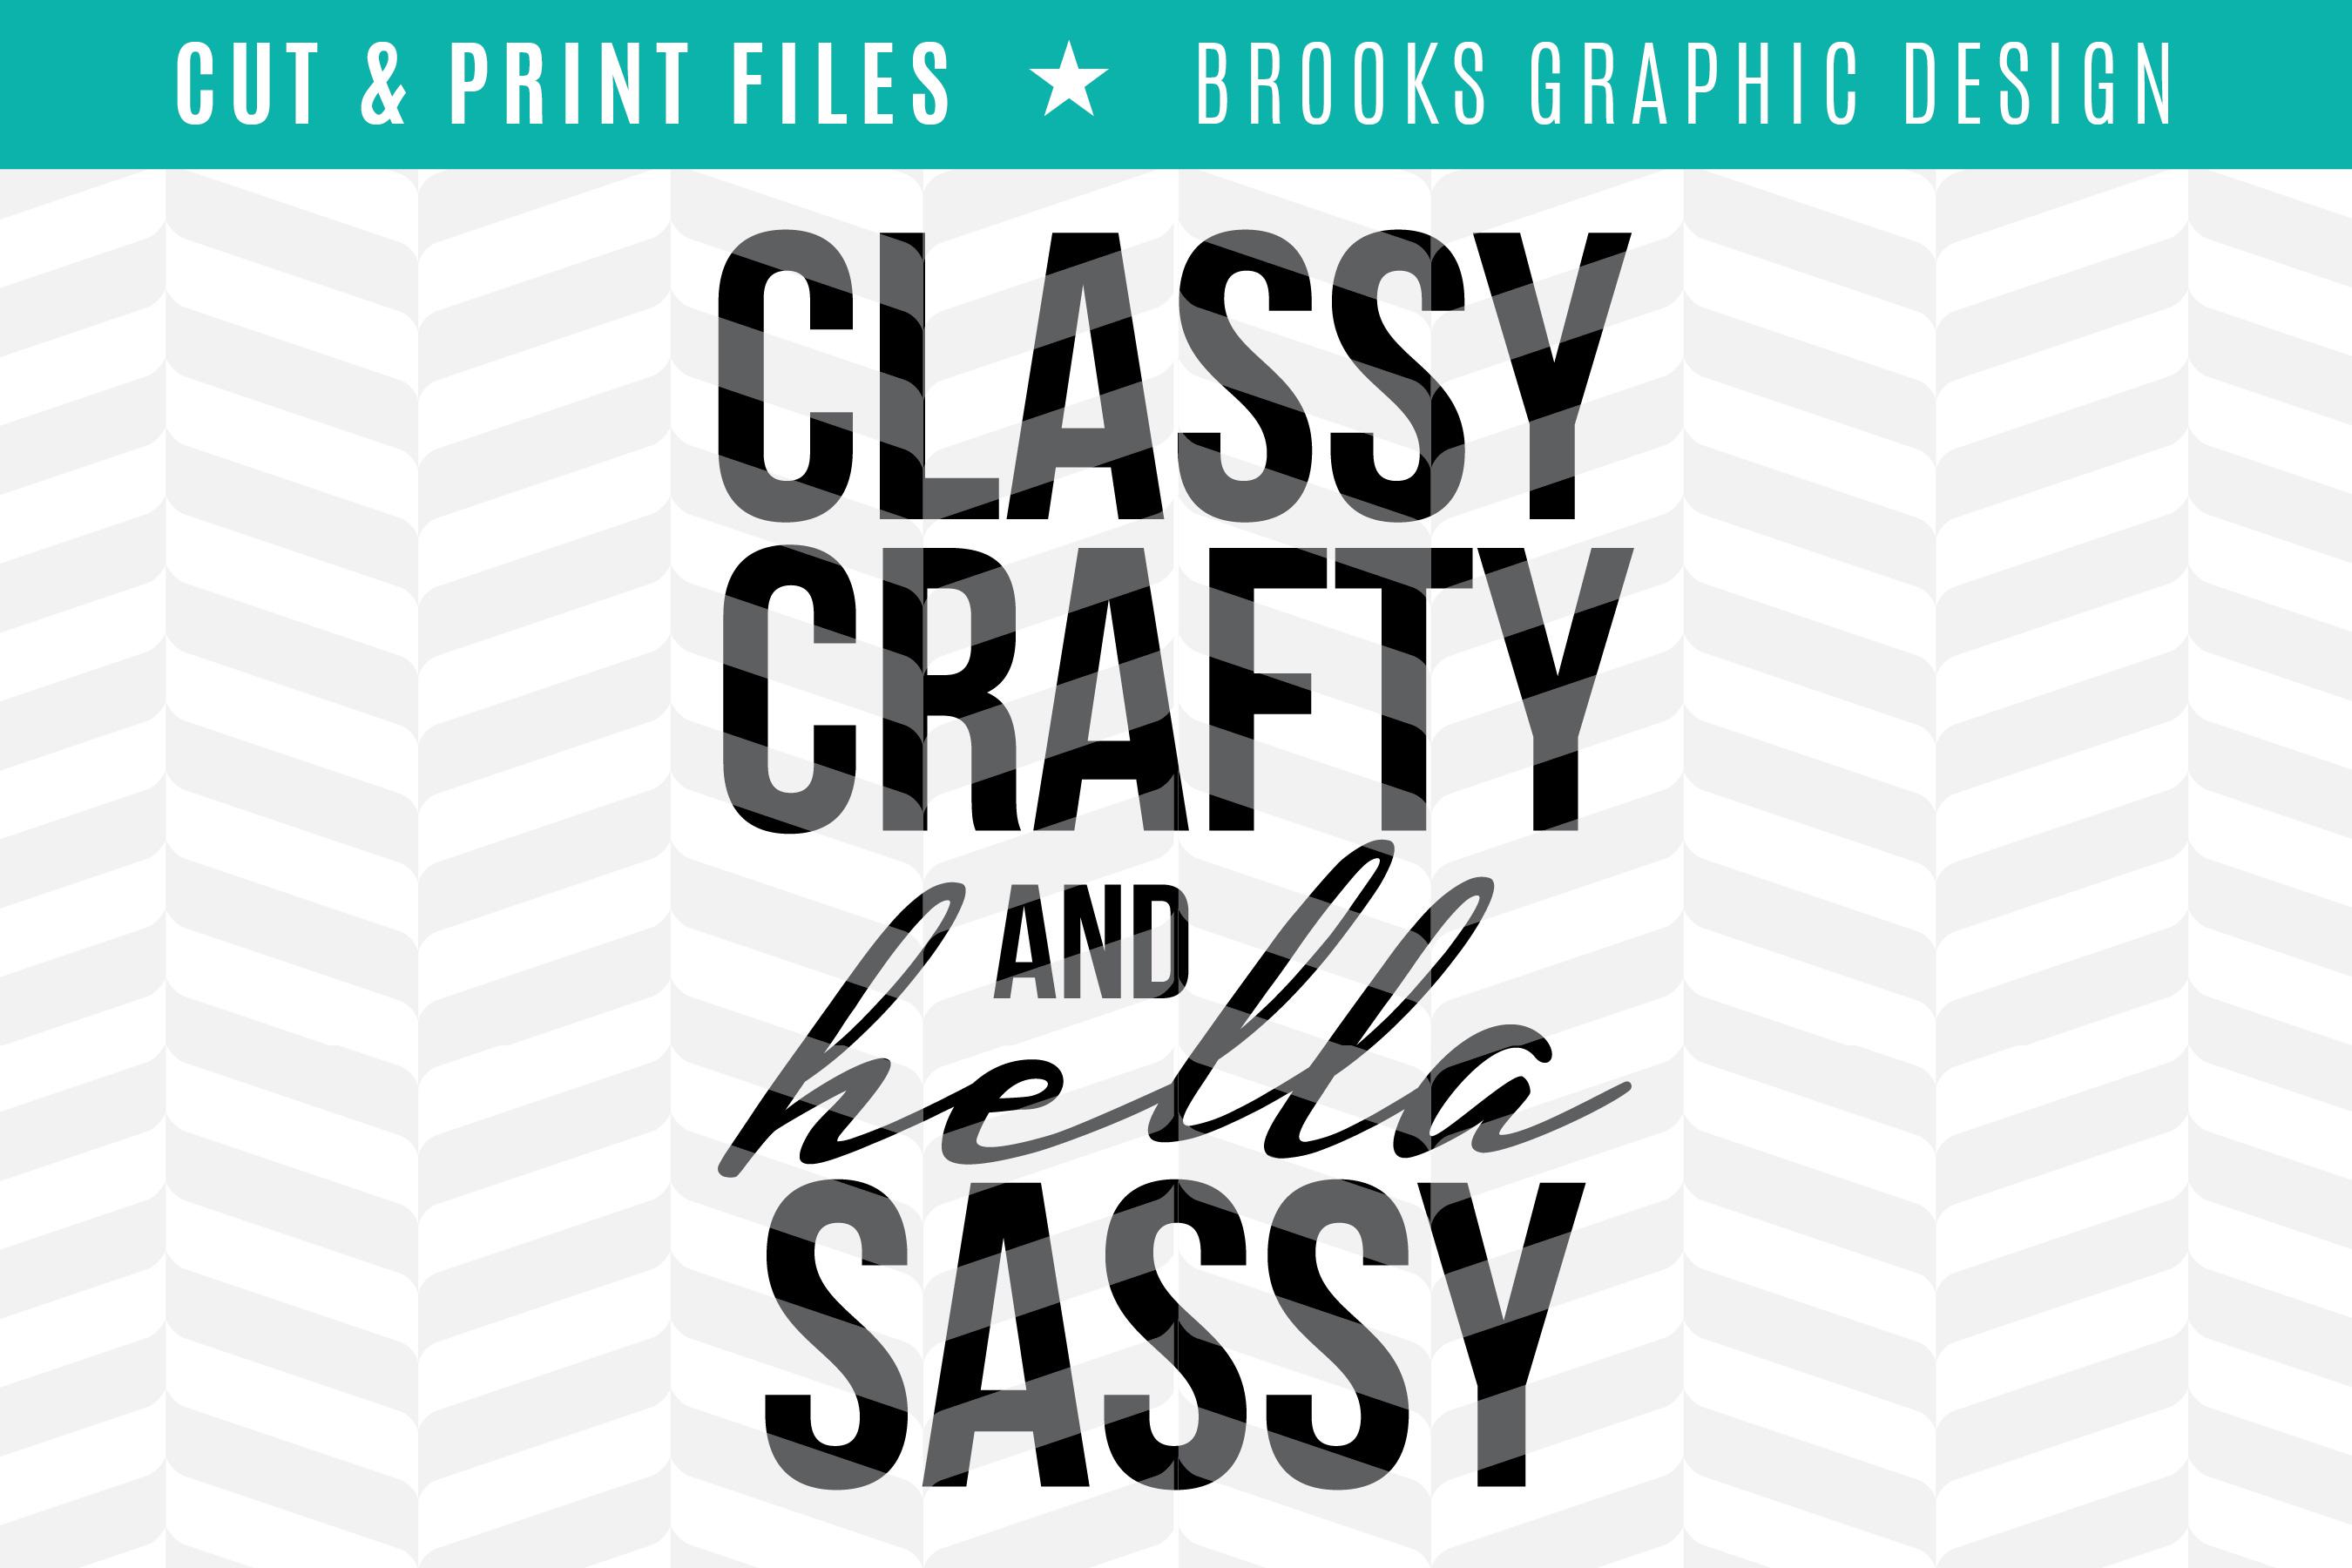 Classy Crafty & Hella Sassy - DXF/SVG/PNG/PDF Cut & Print Files example image 1